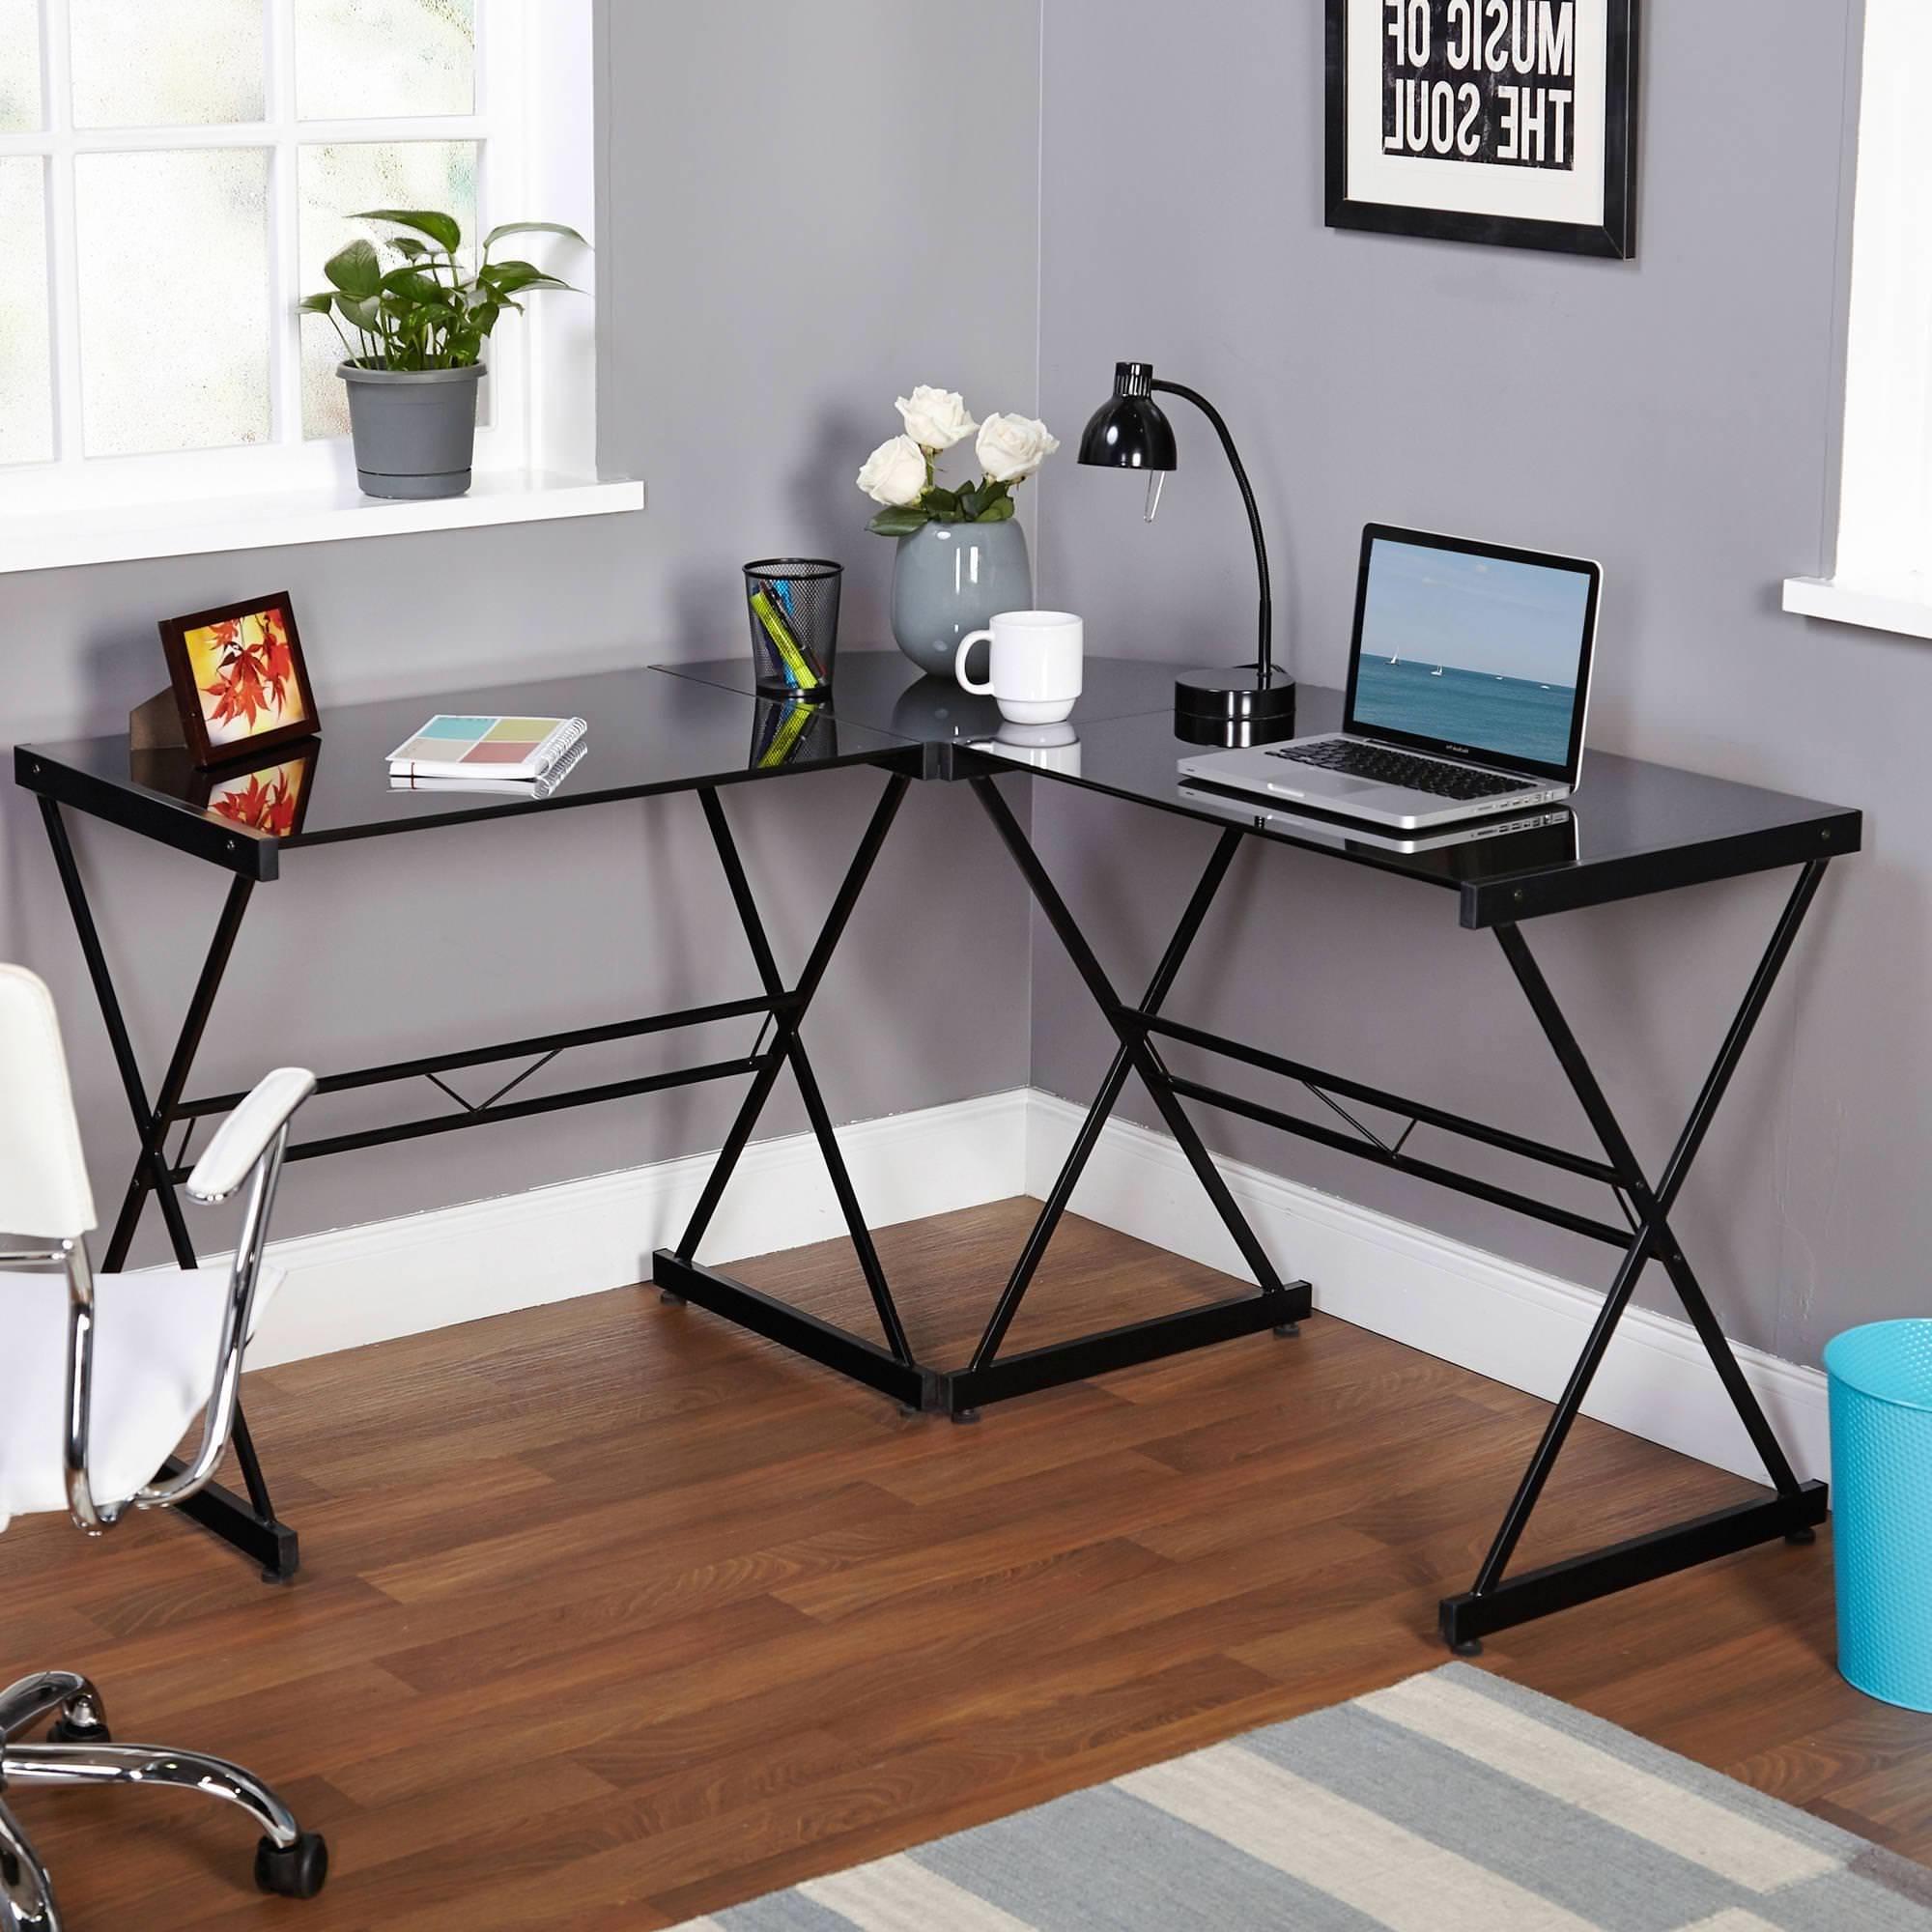 Computer Desks At Best Buy Pertaining To Recent Best Buy Corner Desk Home Office Ikea — Interior Home Design (View 6 of 20)